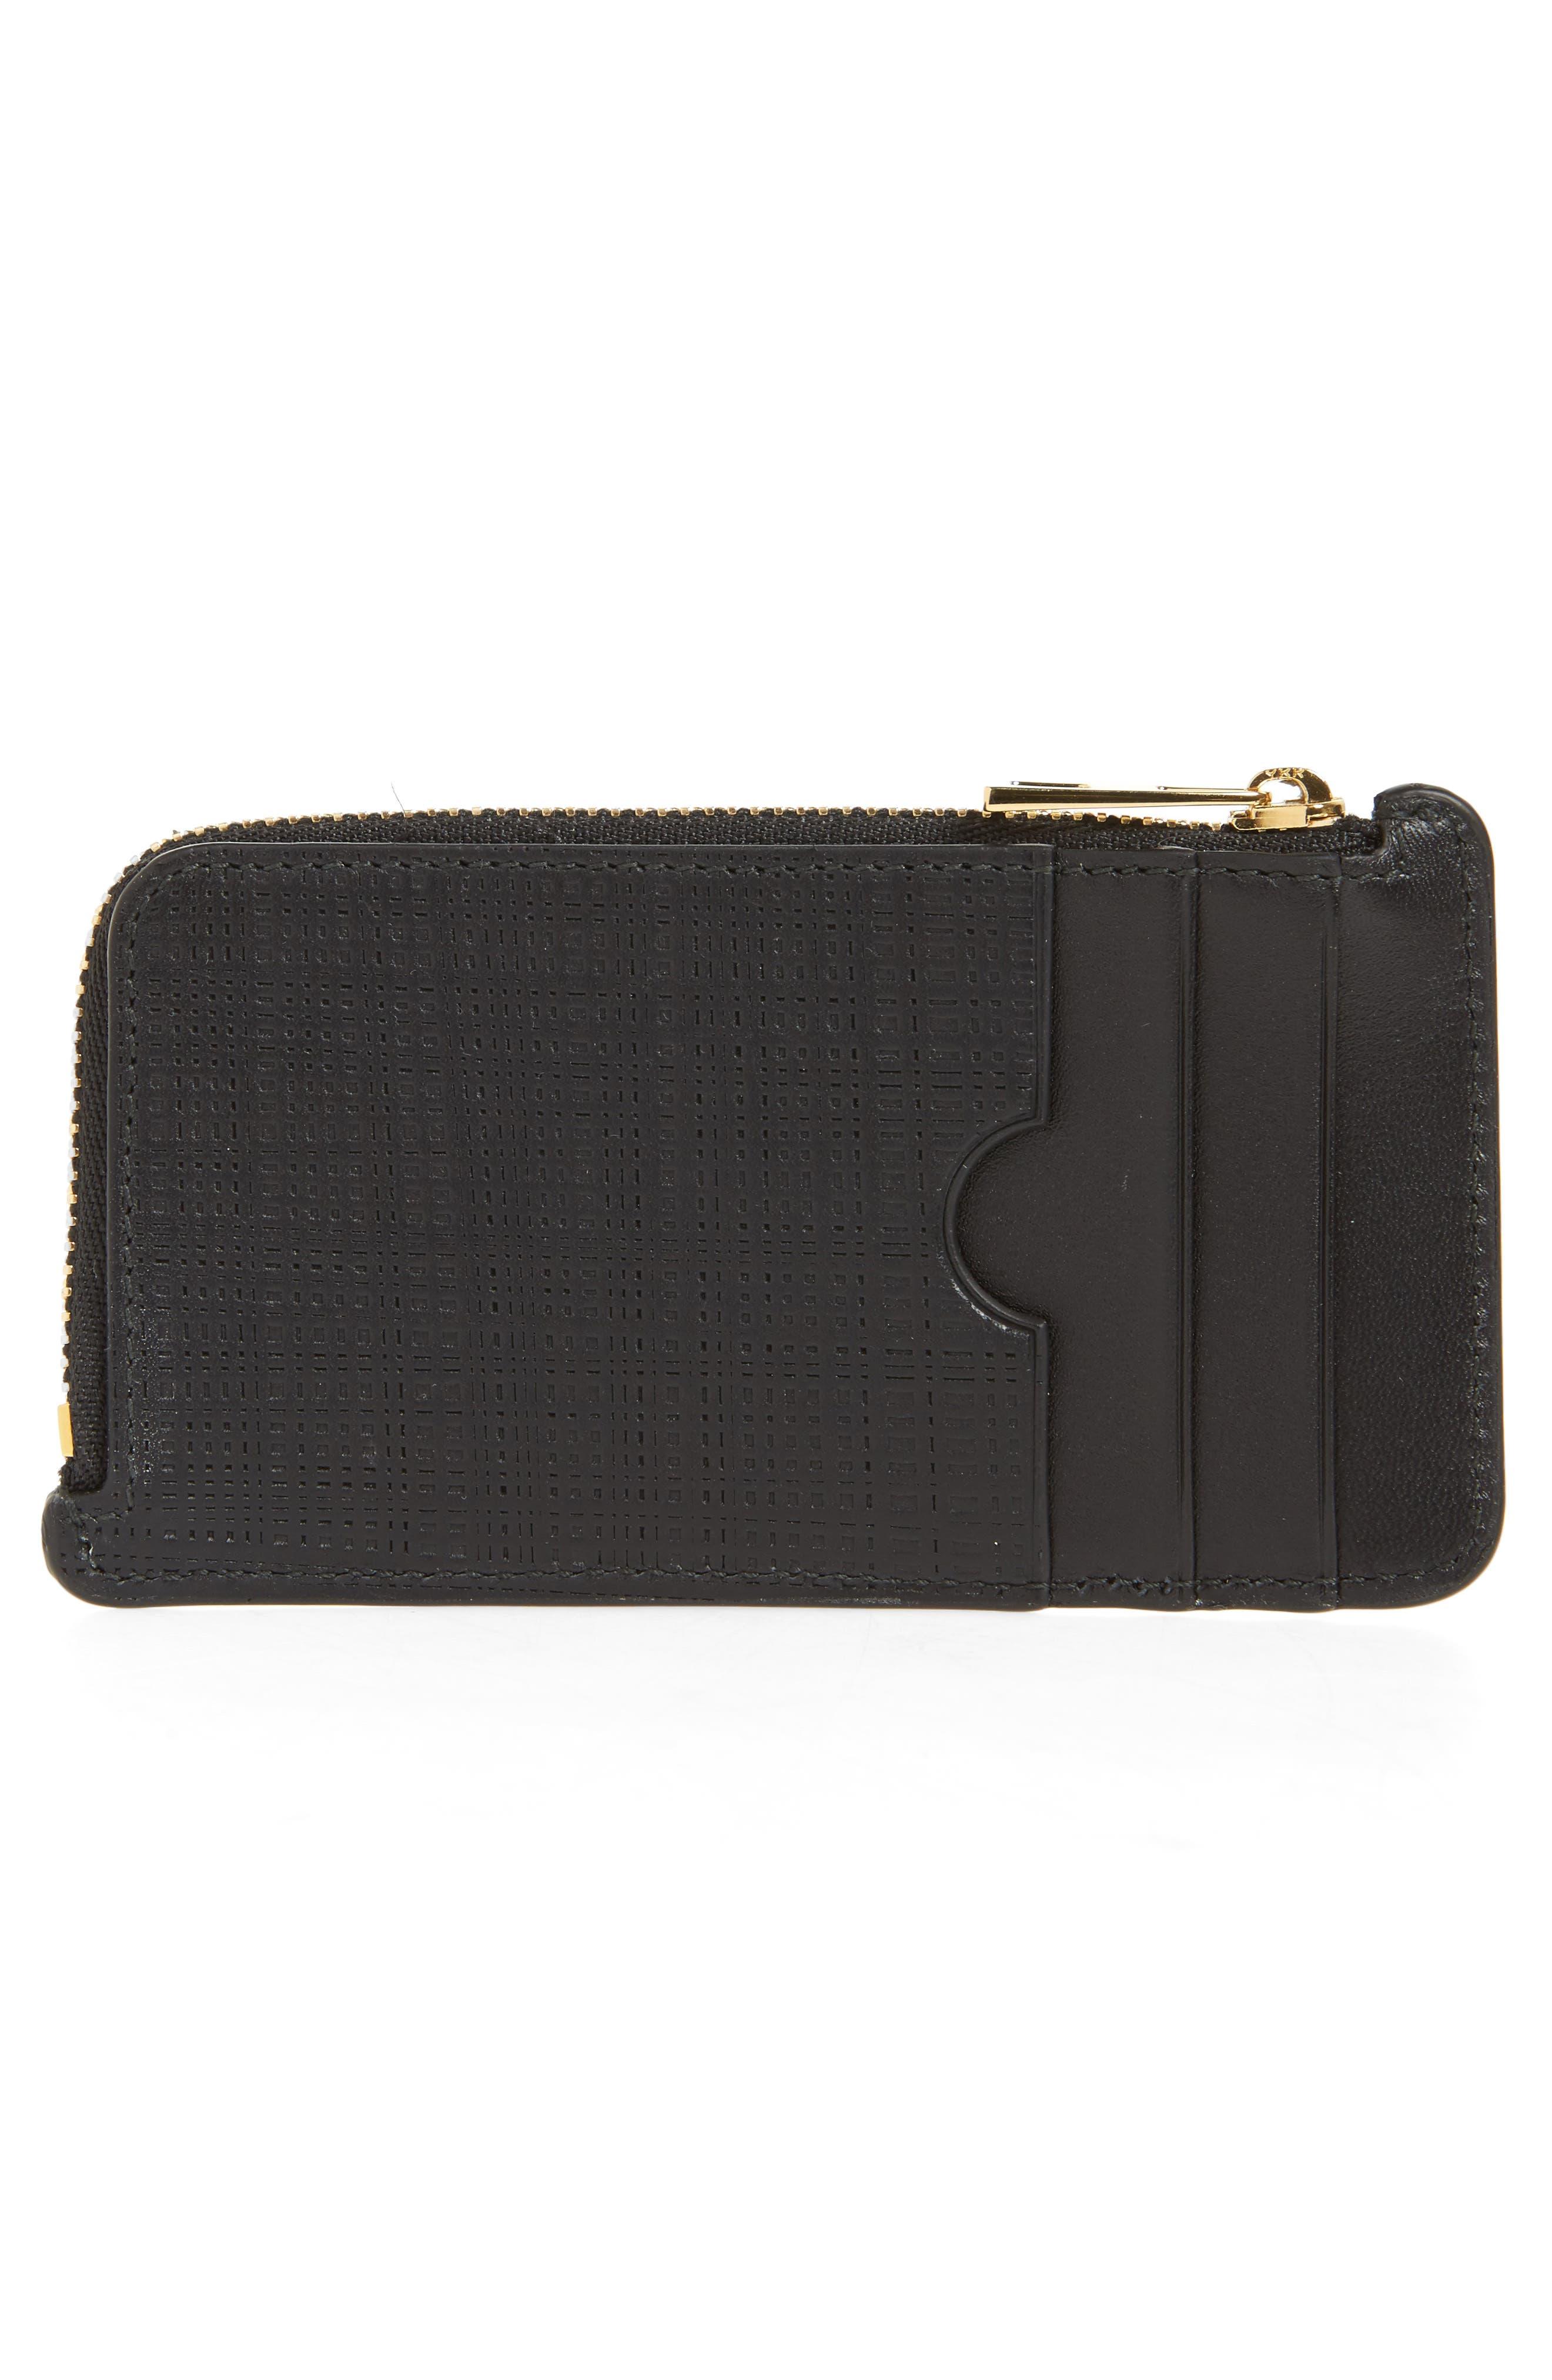 Calfskin Leather Zip Wallet,                             Alternate thumbnail 2, color,                             001